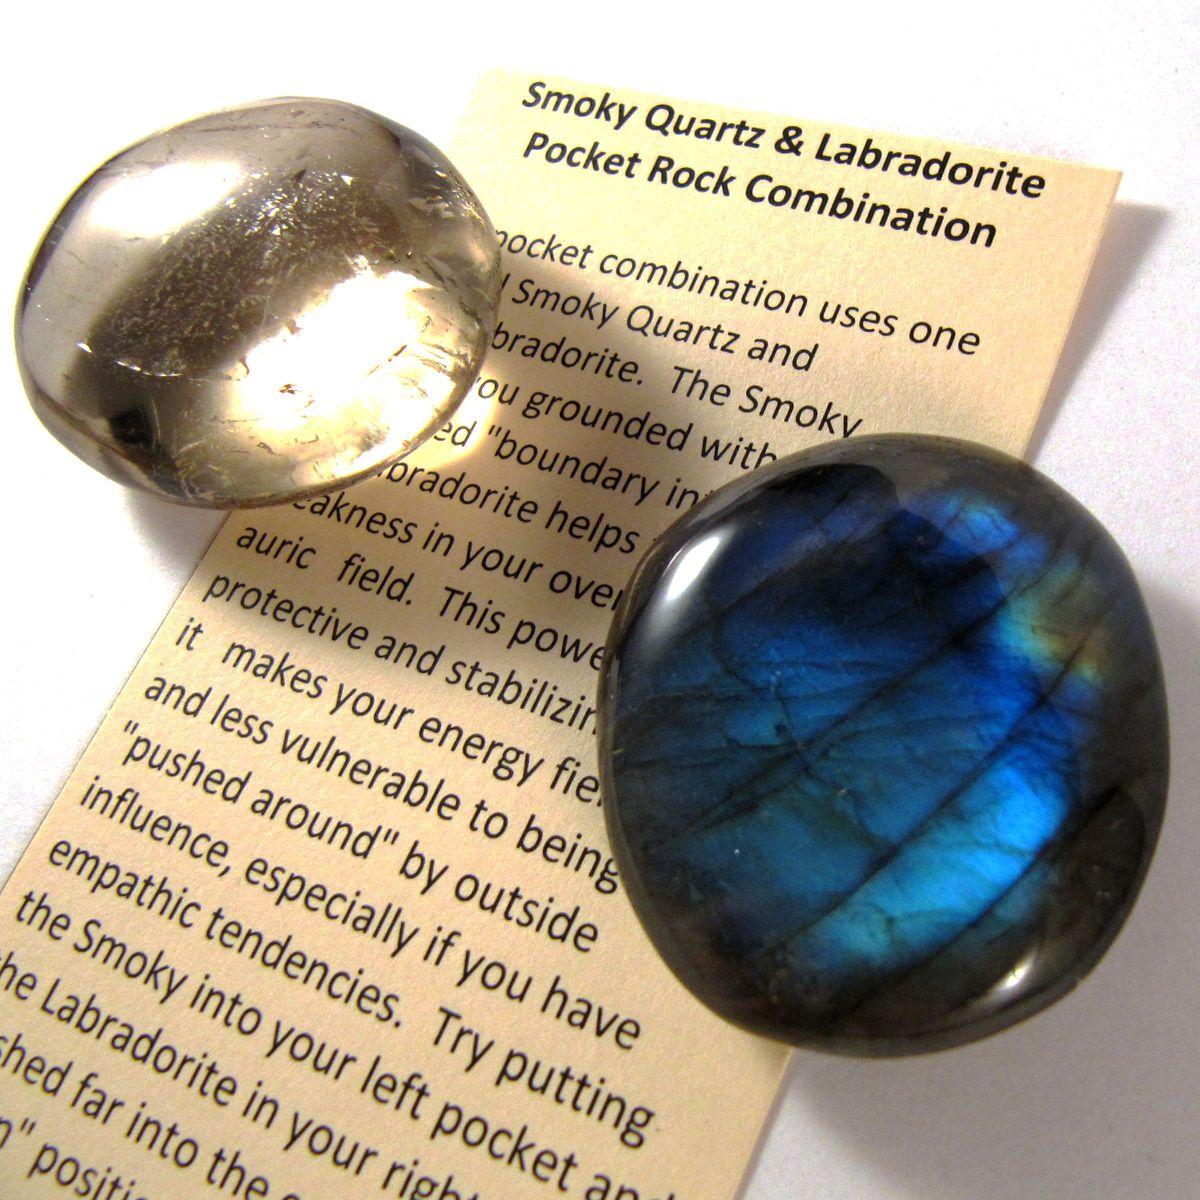 Labradorite And Smoky Quartz Pocket Rocks Crystal Healing Crystals Crystals And Gemstones